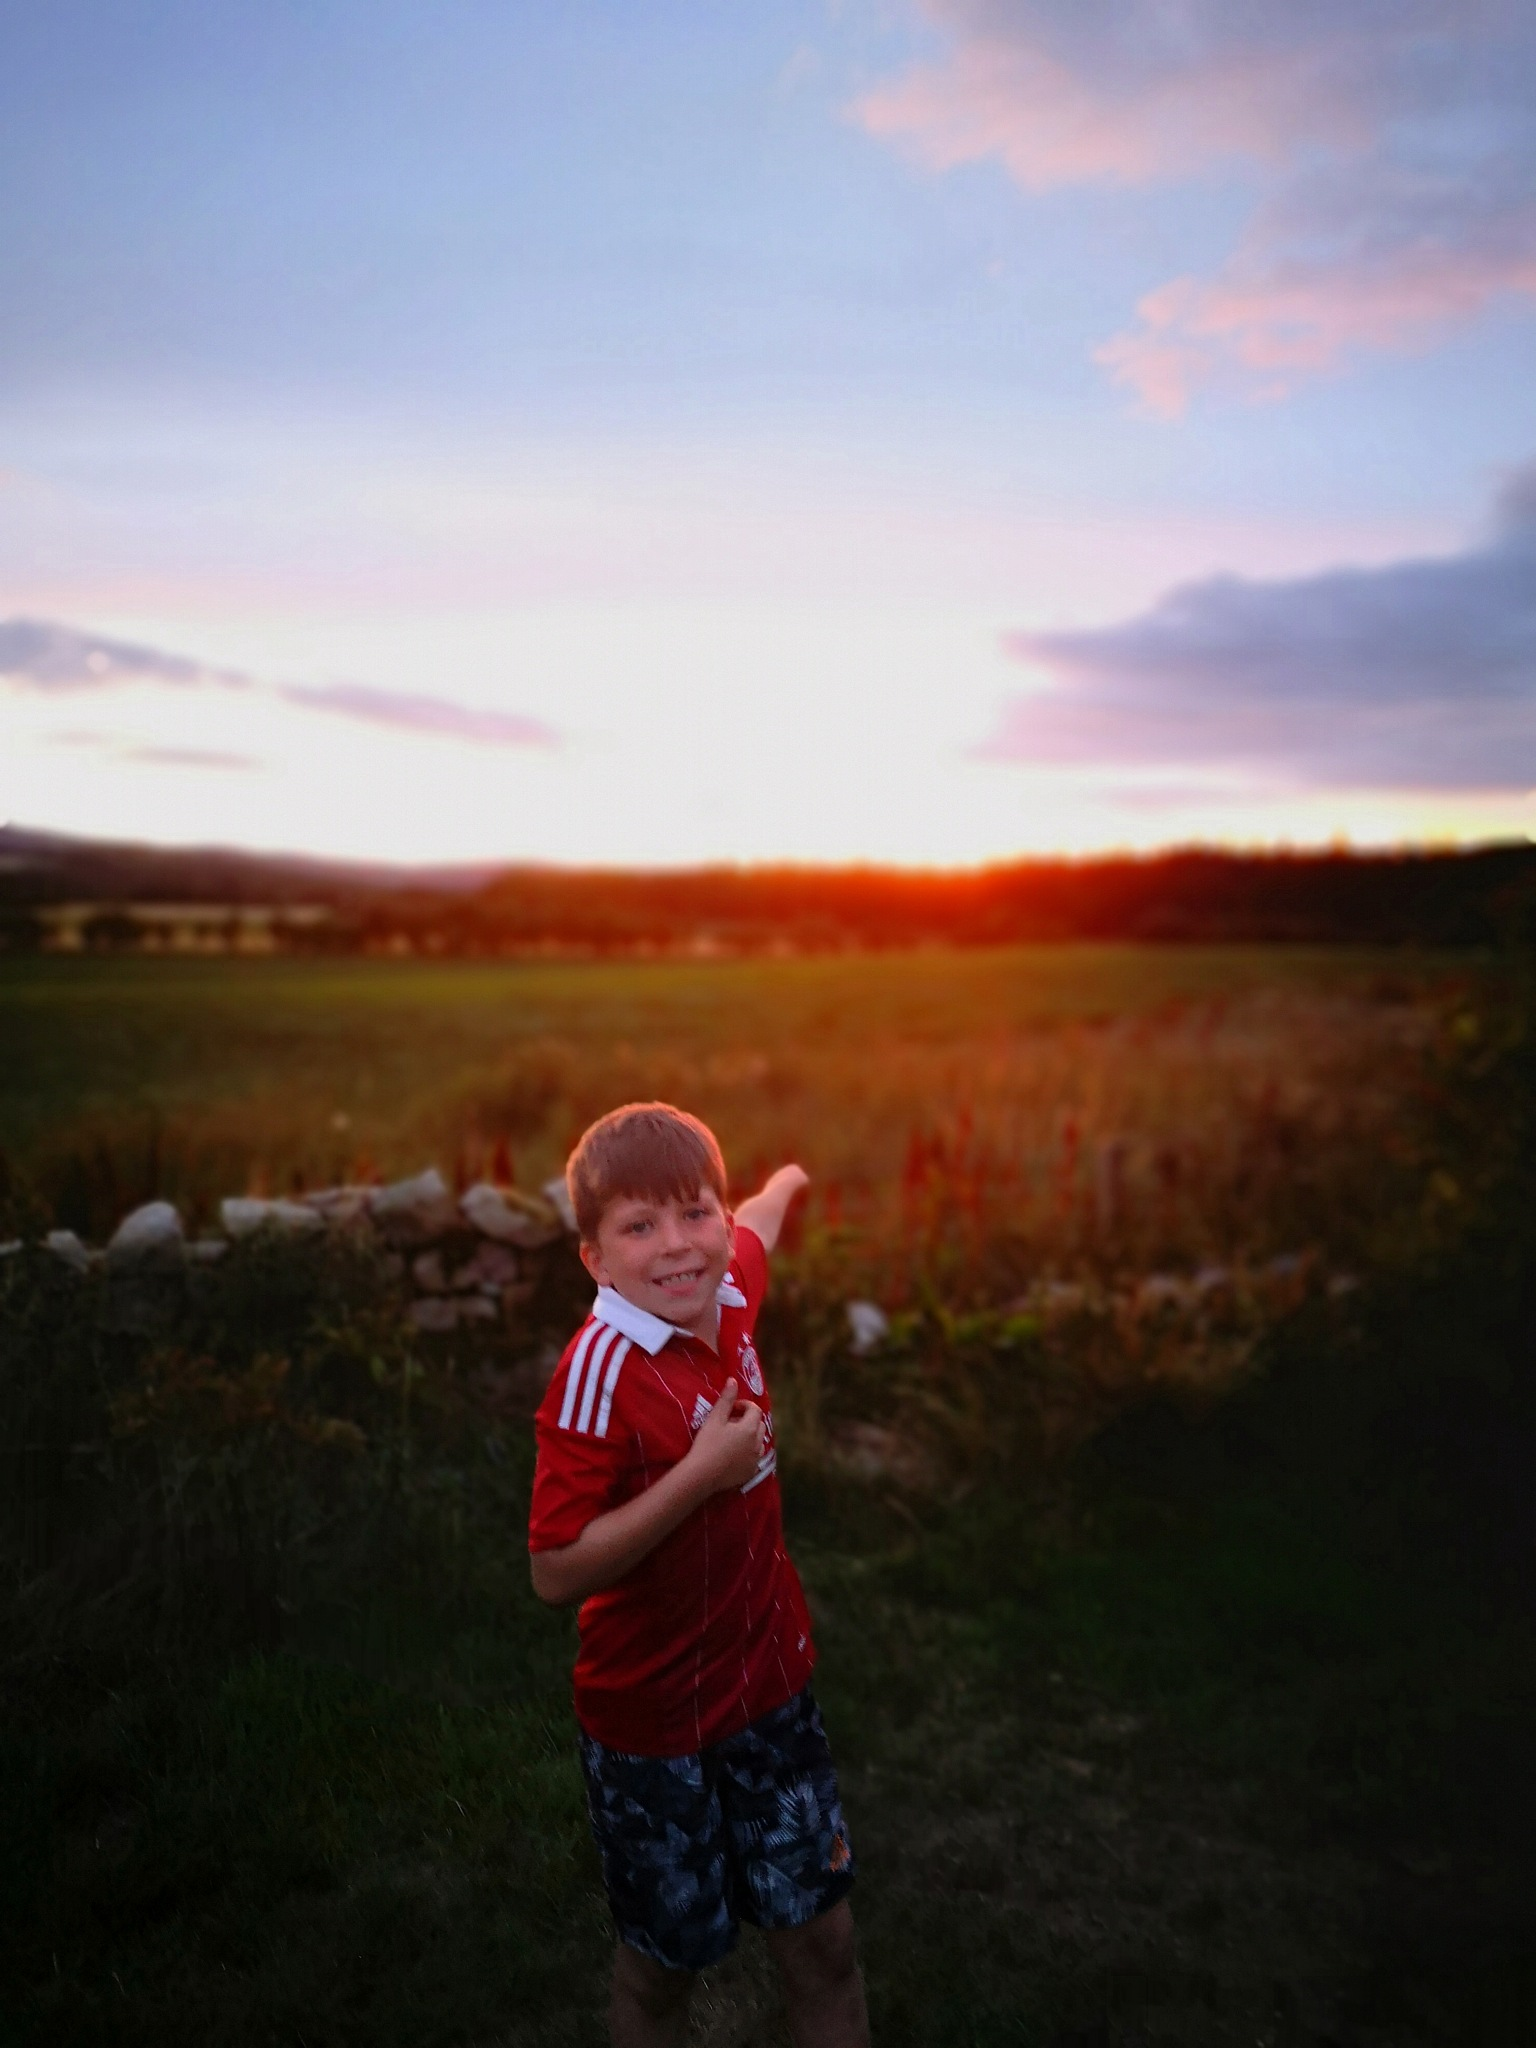 The joy of the setting sun by PaulAnderson